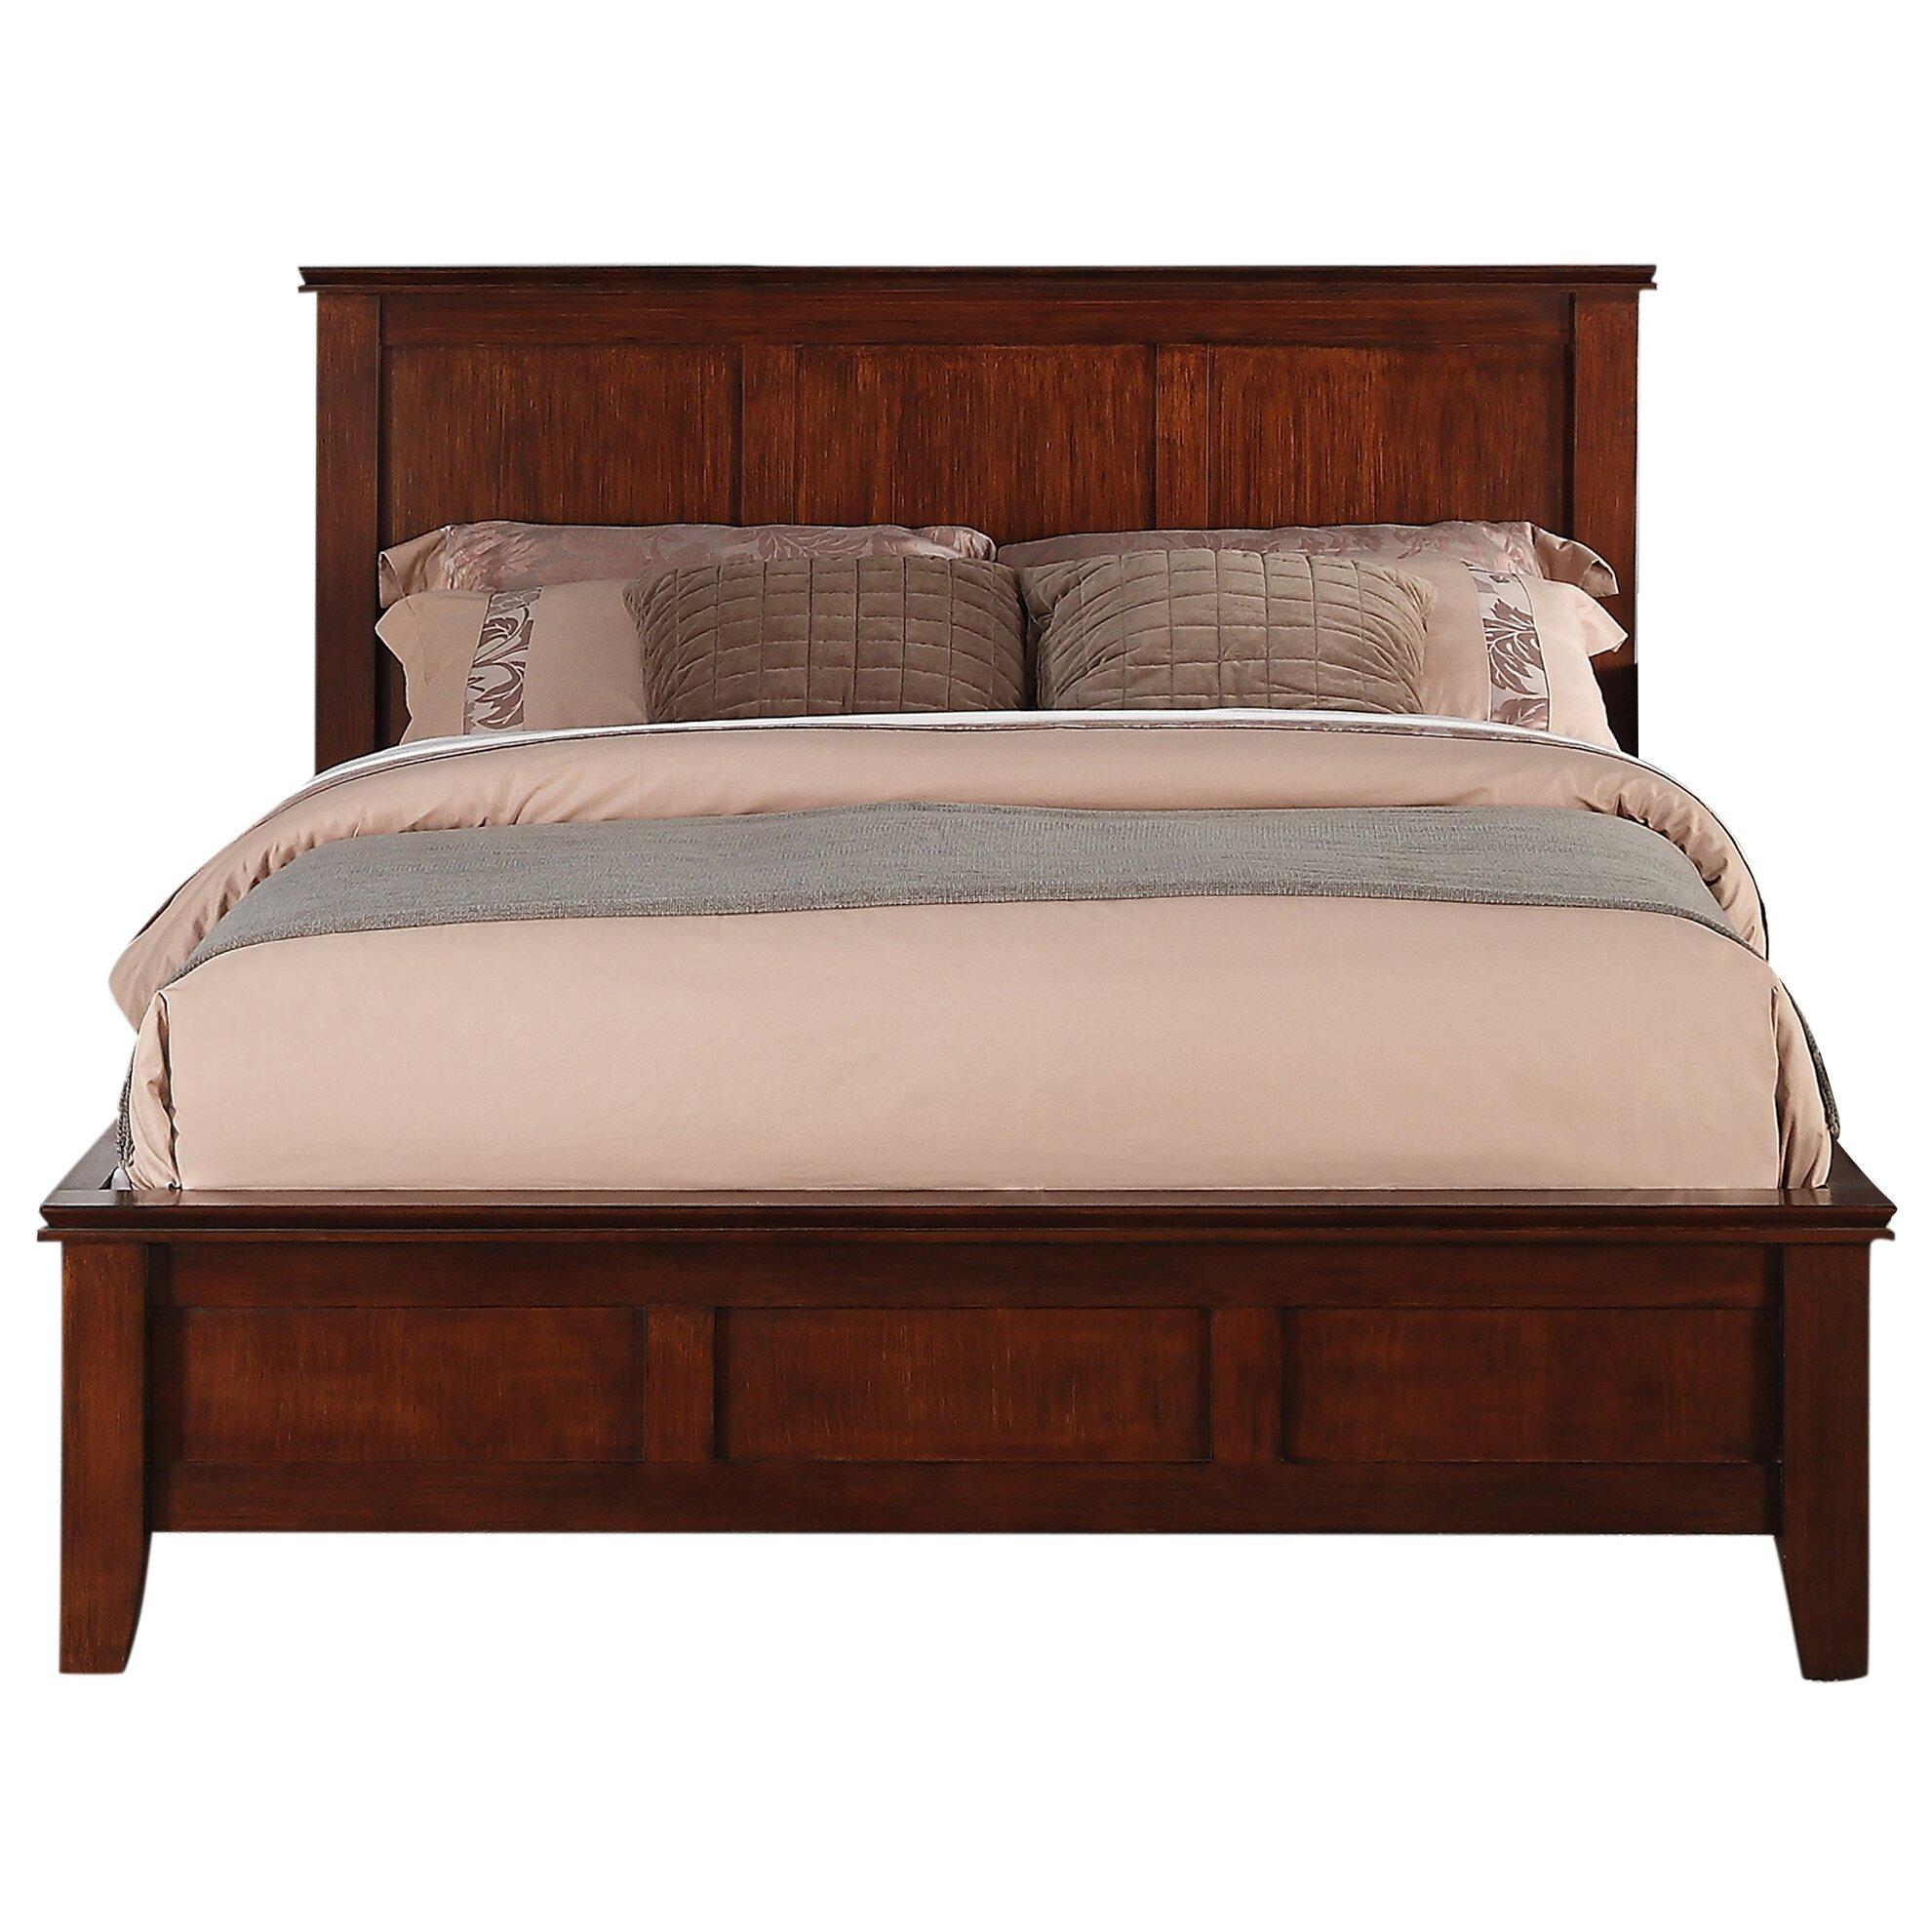 simpli home queen platform bed wayfair. Black Bedroom Furniture Sets. Home Design Ideas